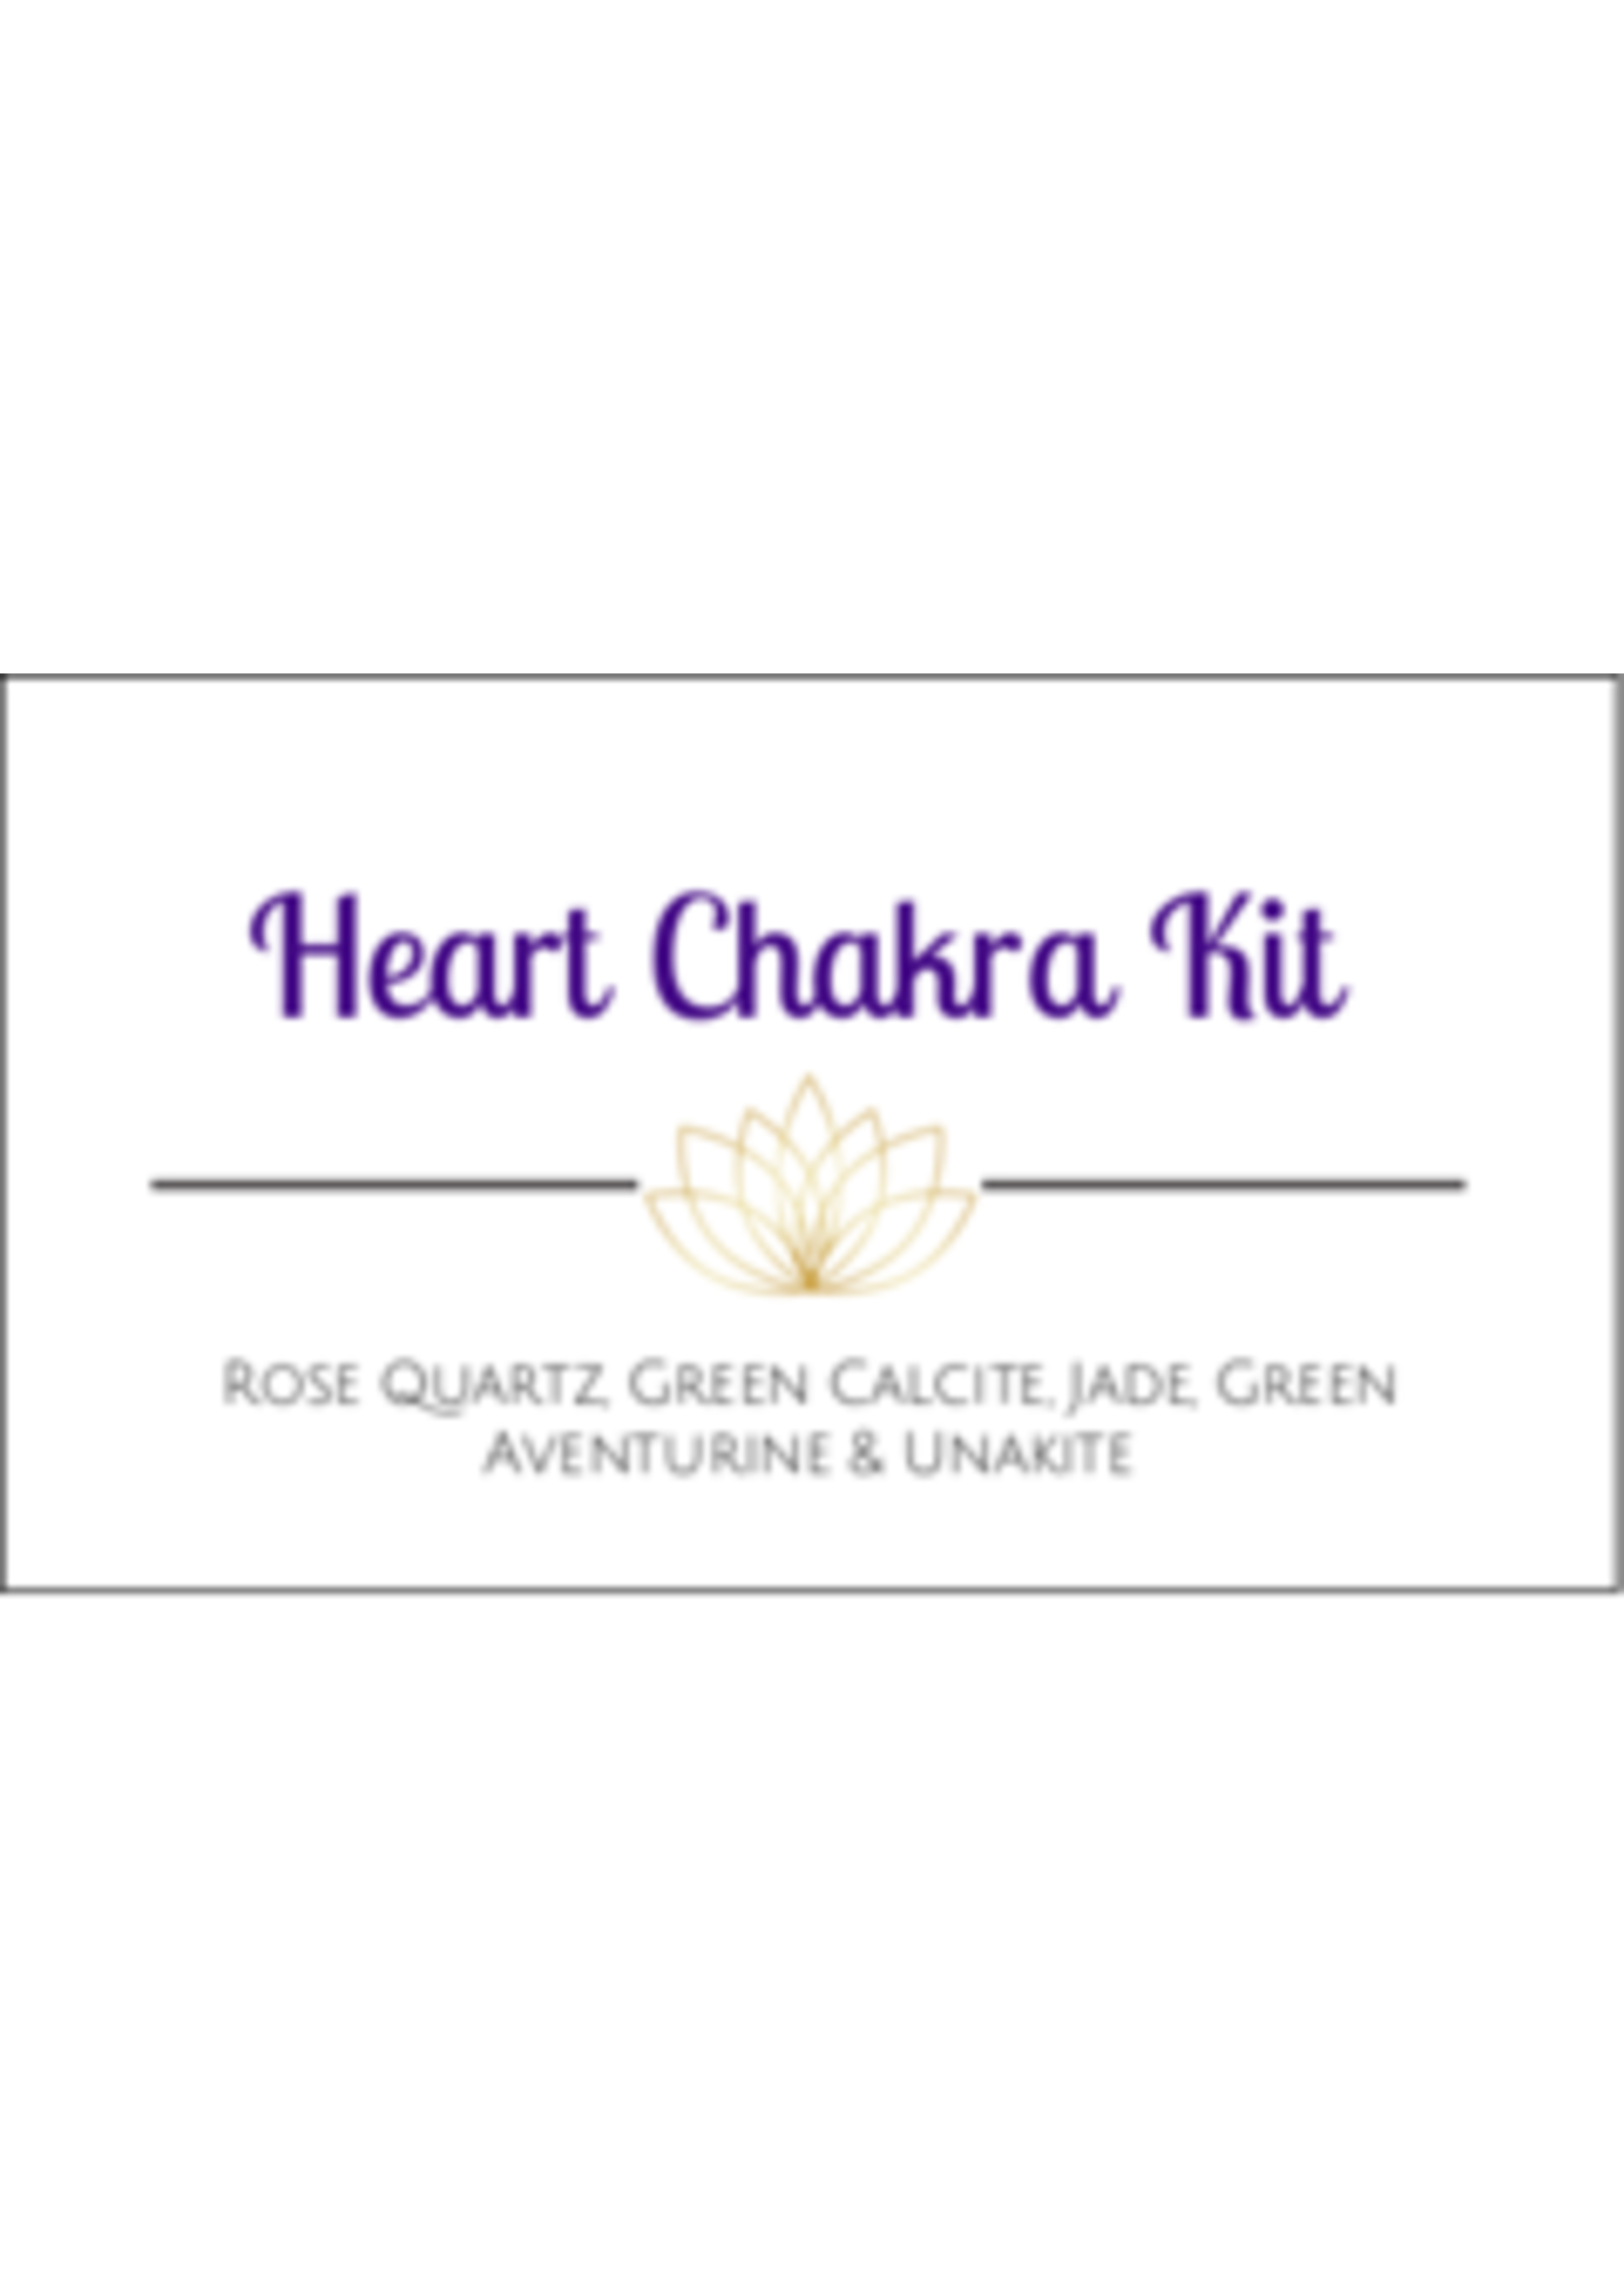 Heart Chakra Crystal Kit Cards - Box of 100